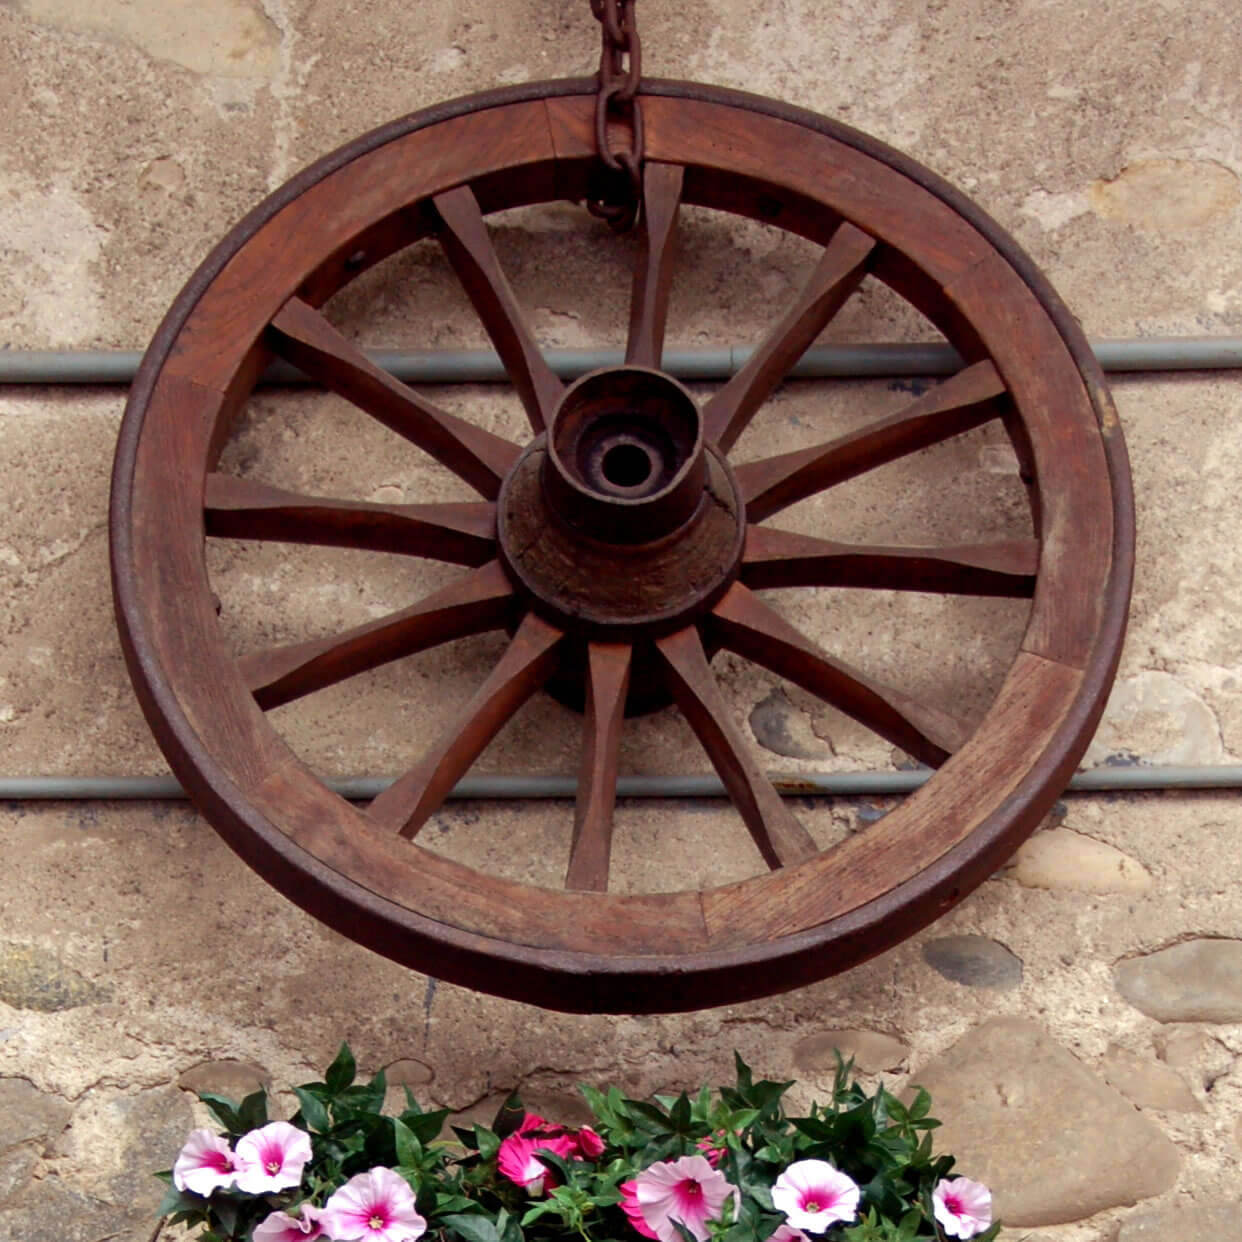 Simbologia Cigana: A Roda